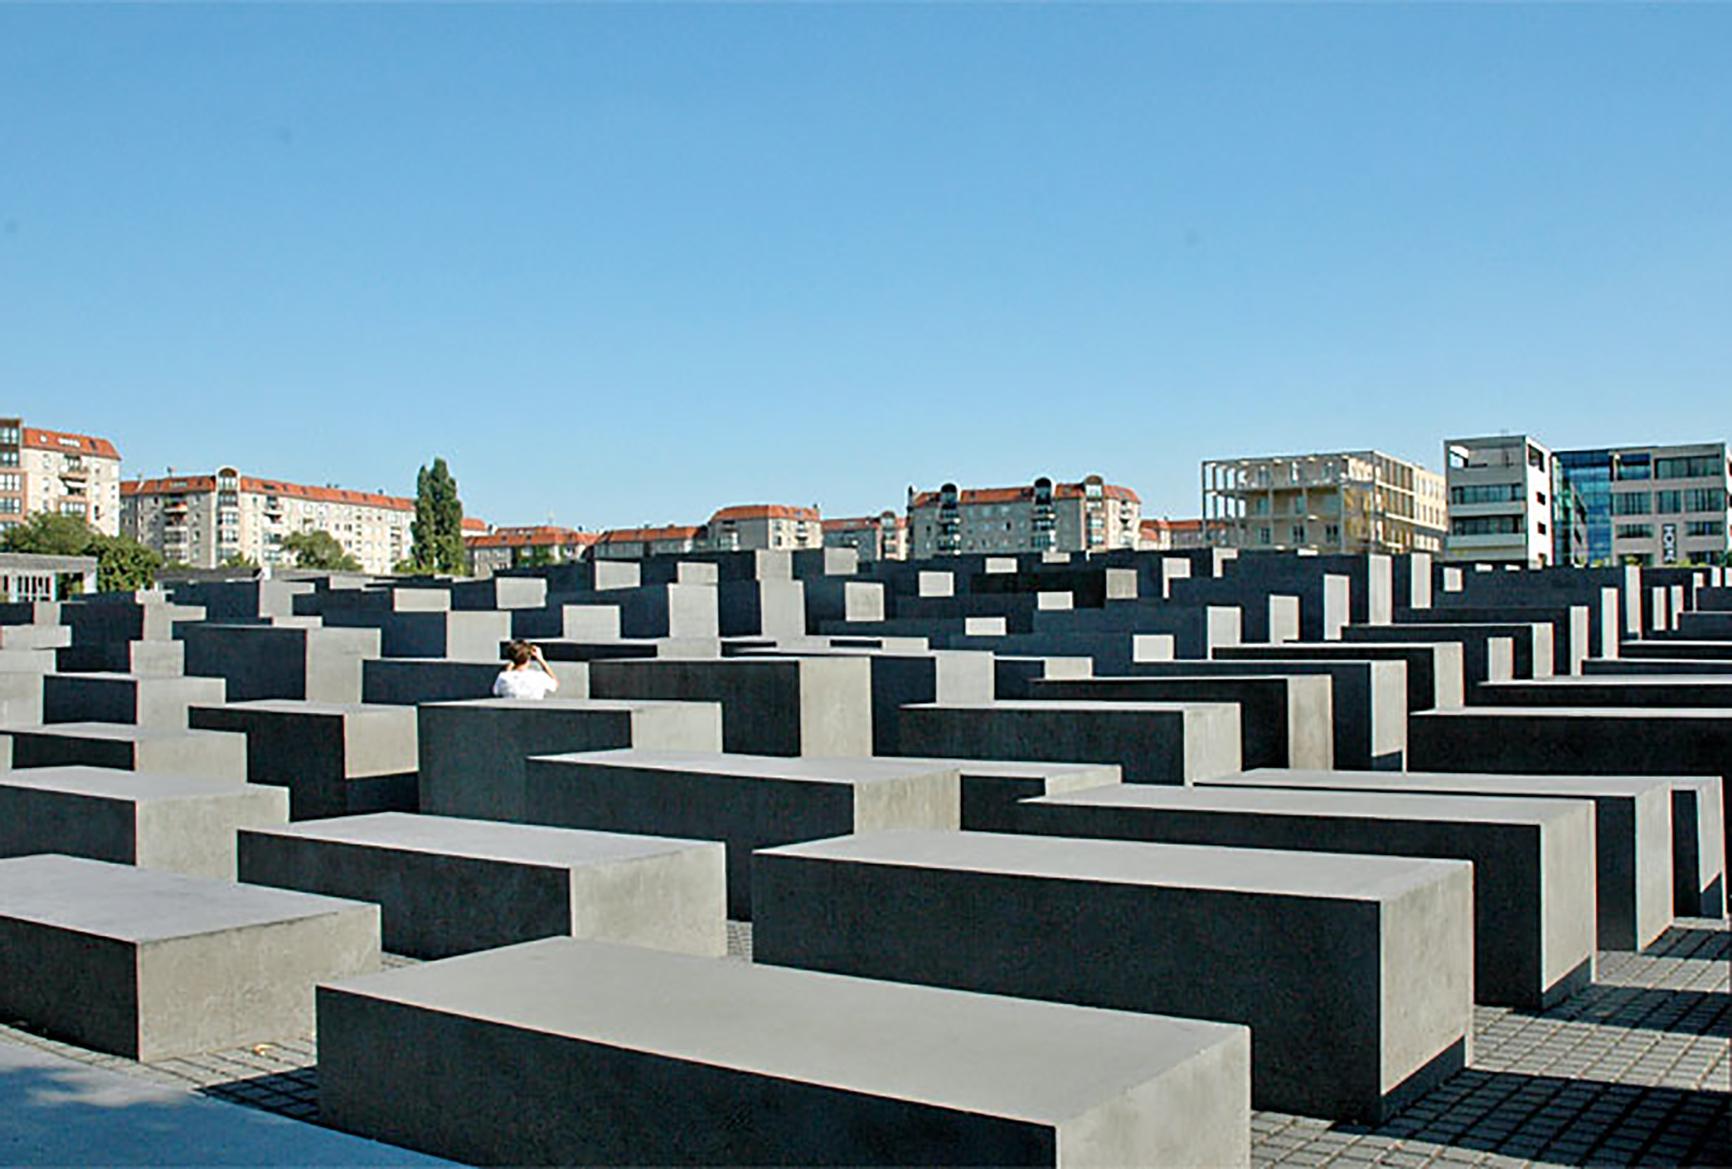 berlino-olocausto-monumento-travelblogger-styleshouts